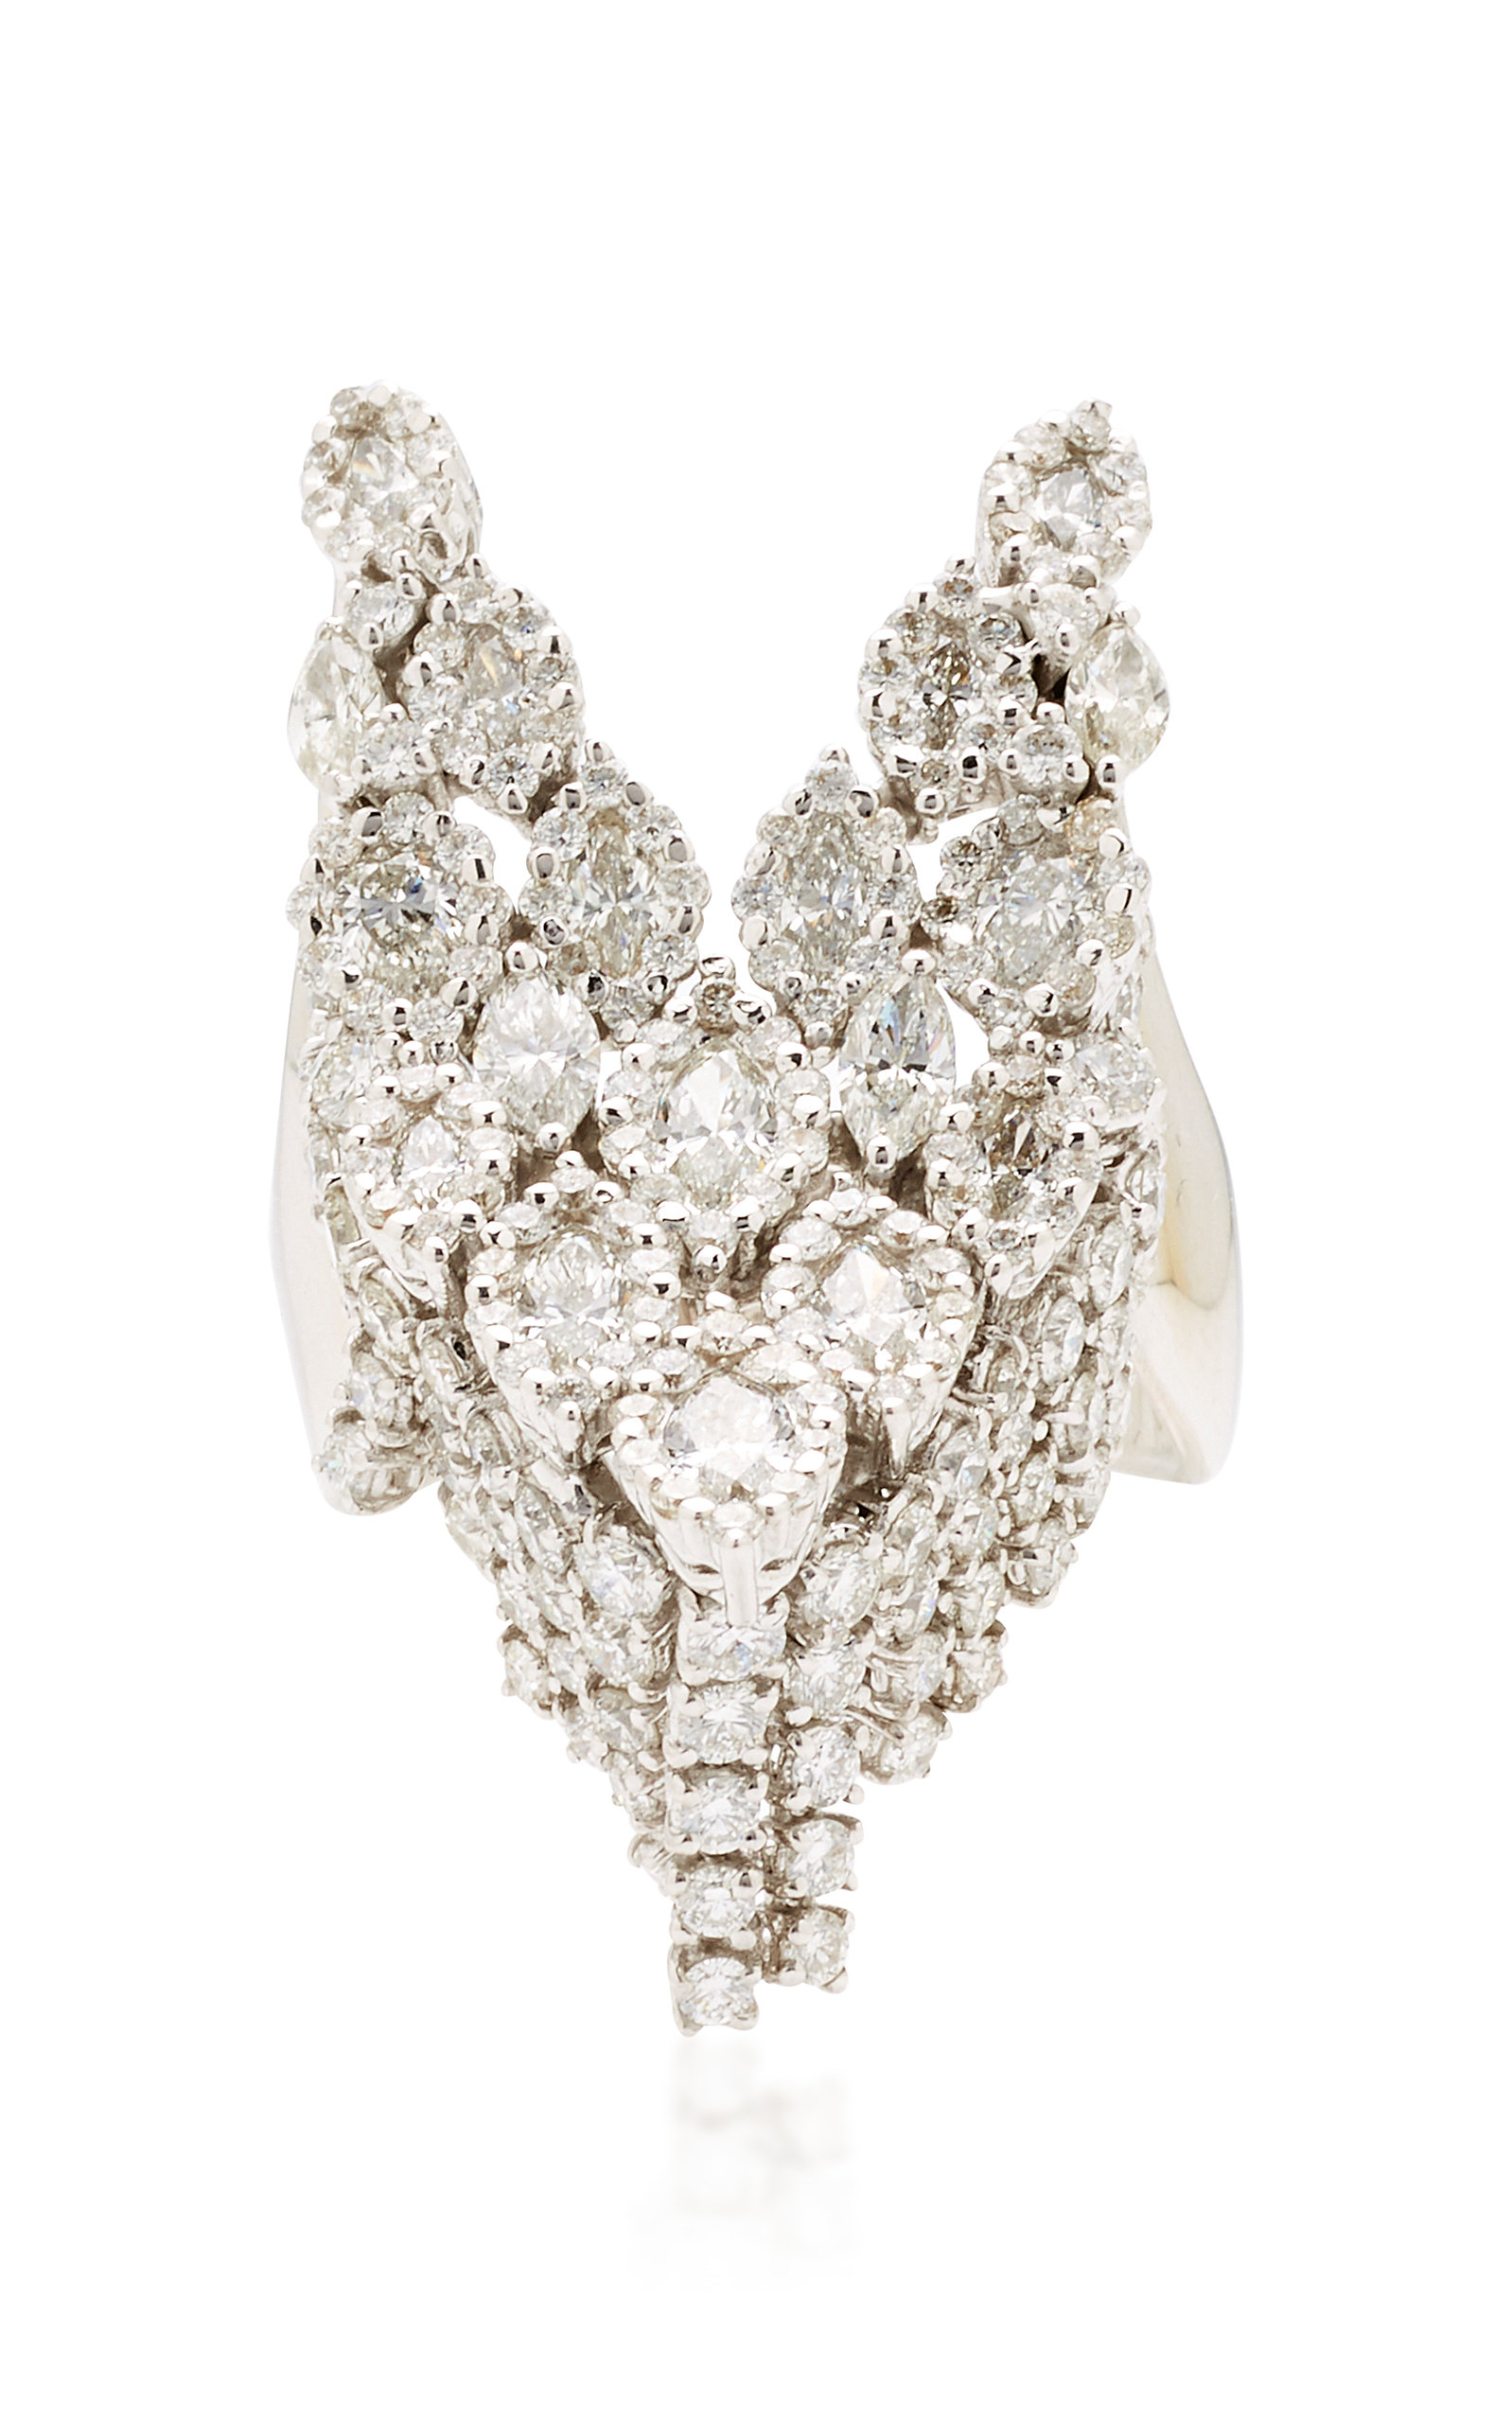 Yeprem Chevalier Long Diamond Ring DfnAAnh1yb